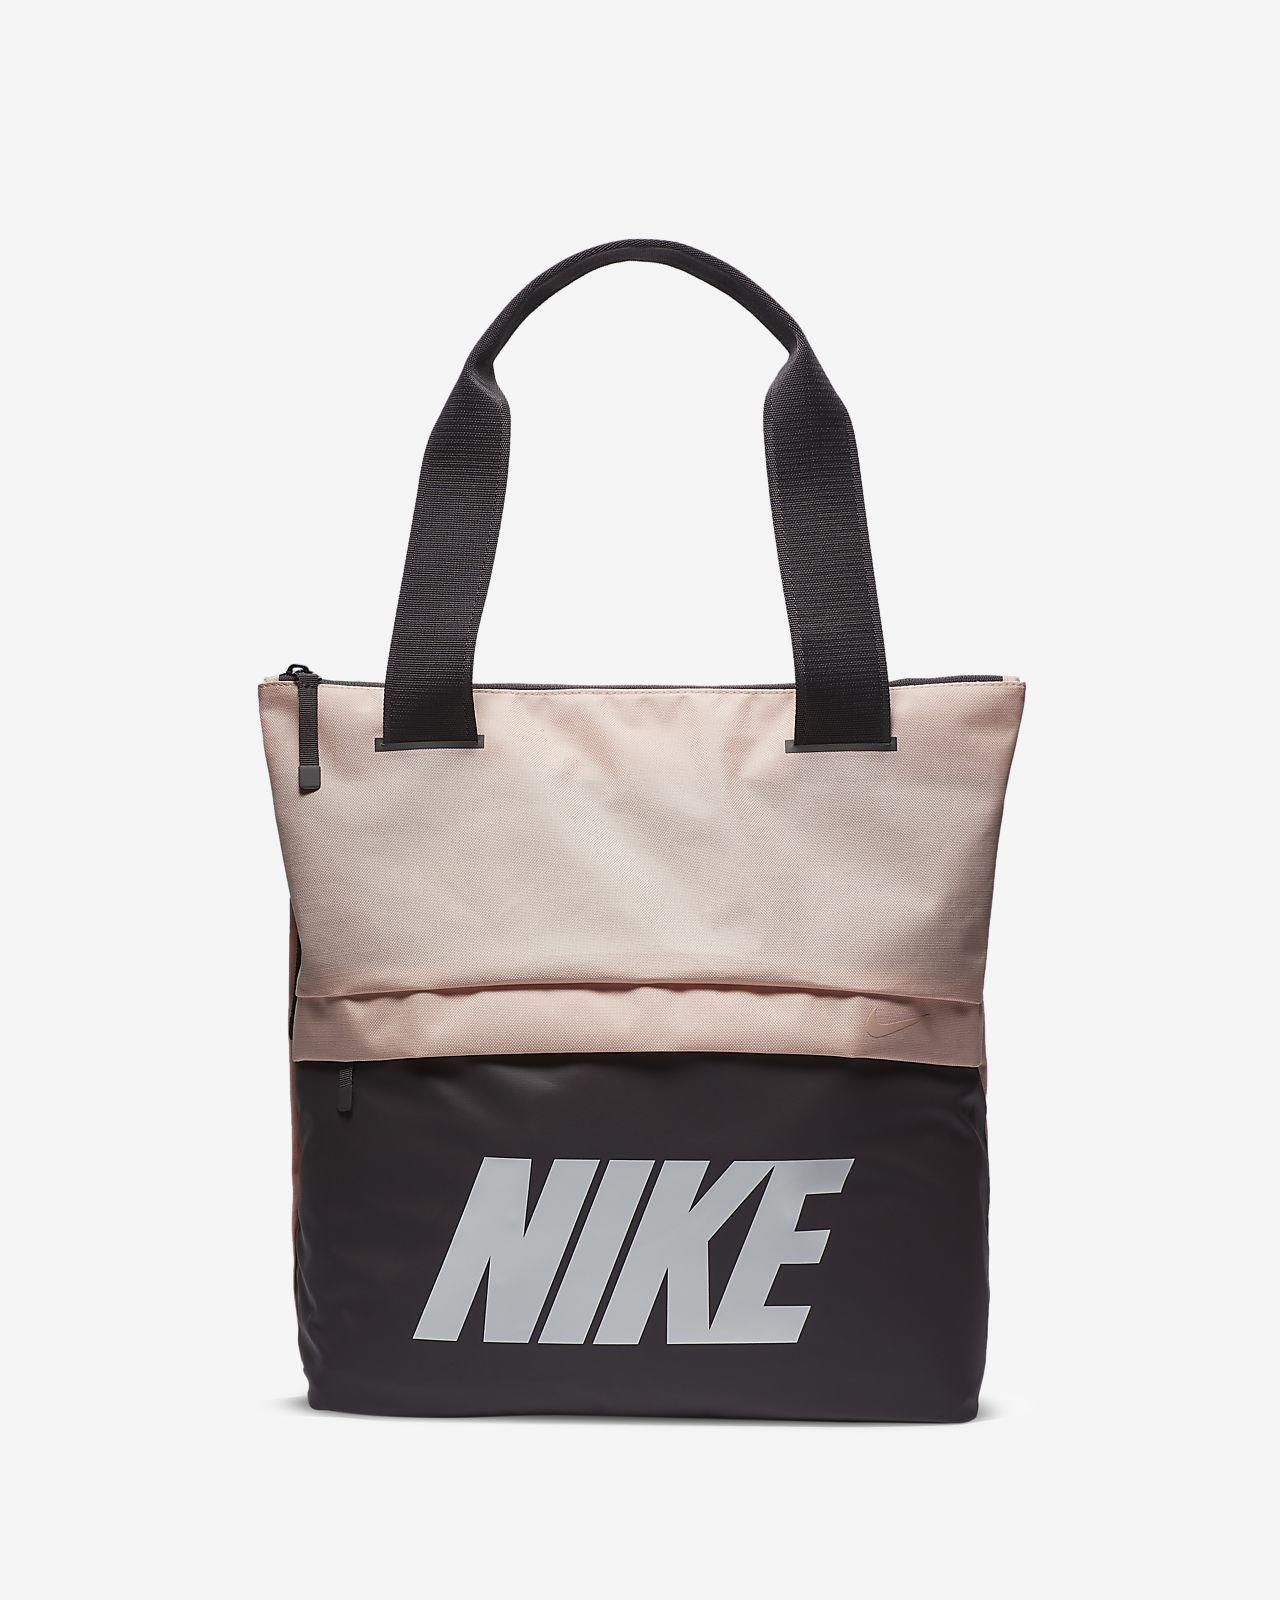 76e8e61d7 con Bolsa mano Radiate de de Mujer Nike estampado entrenamiento qZpAW